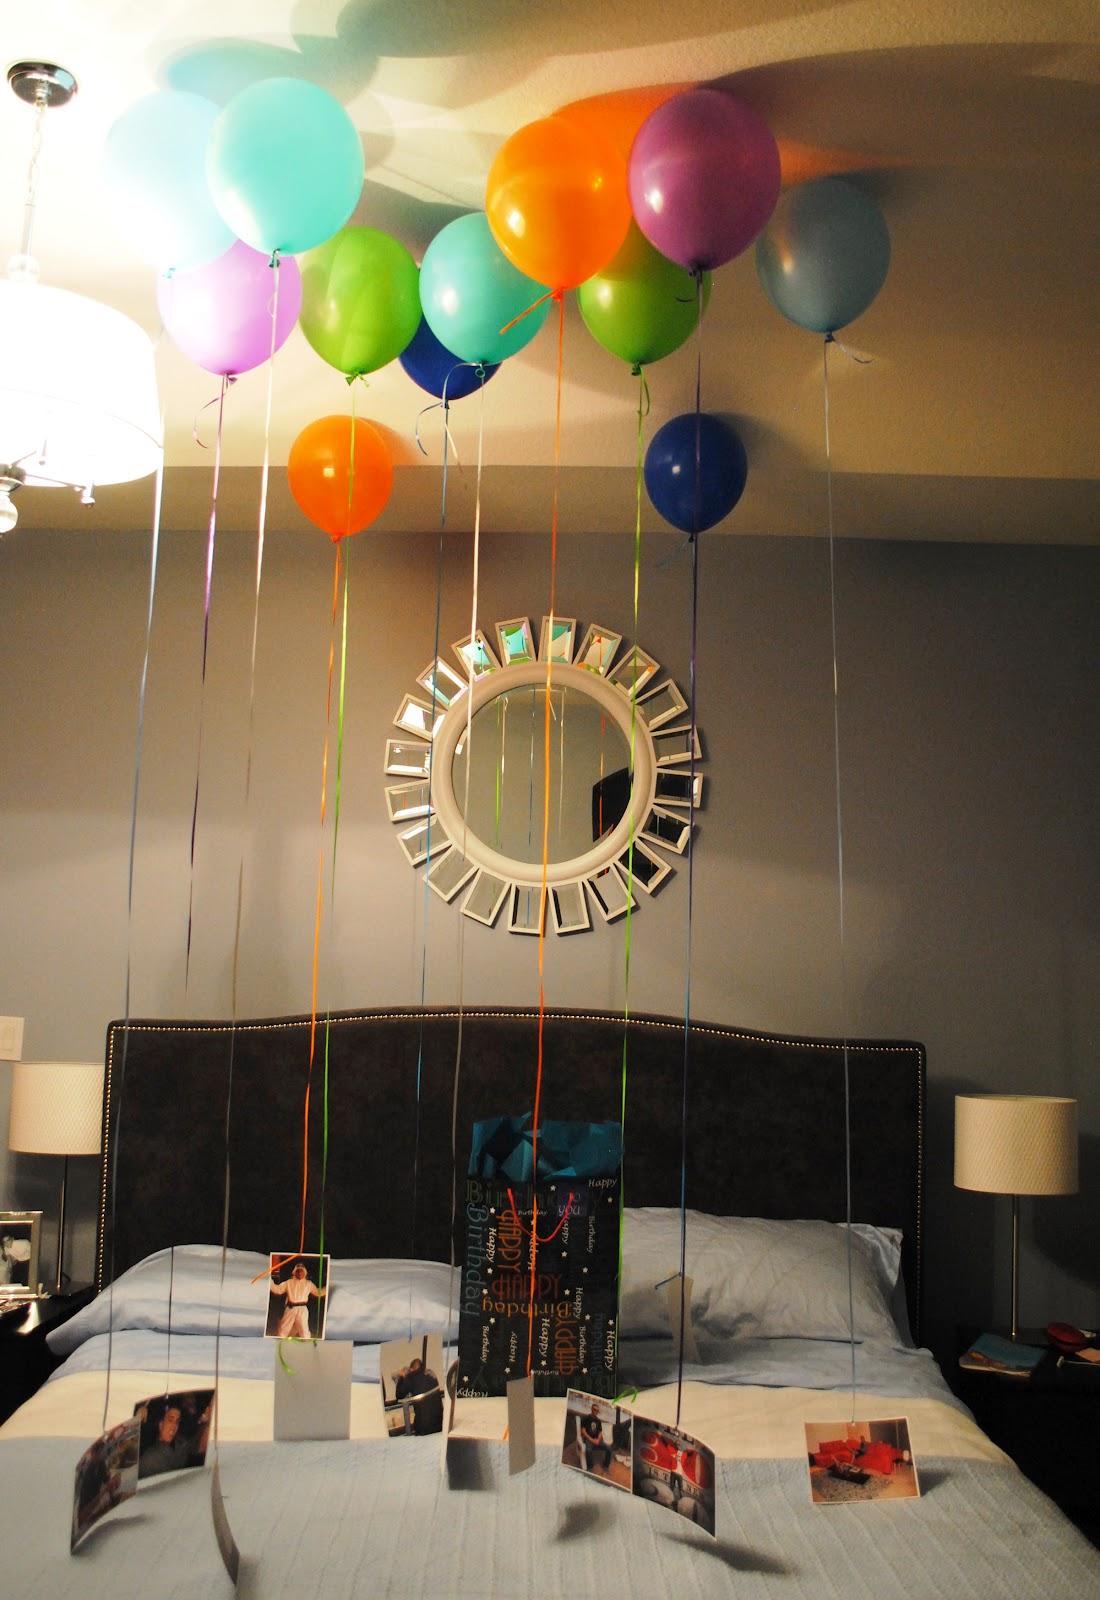 romantic birthday ideas for him